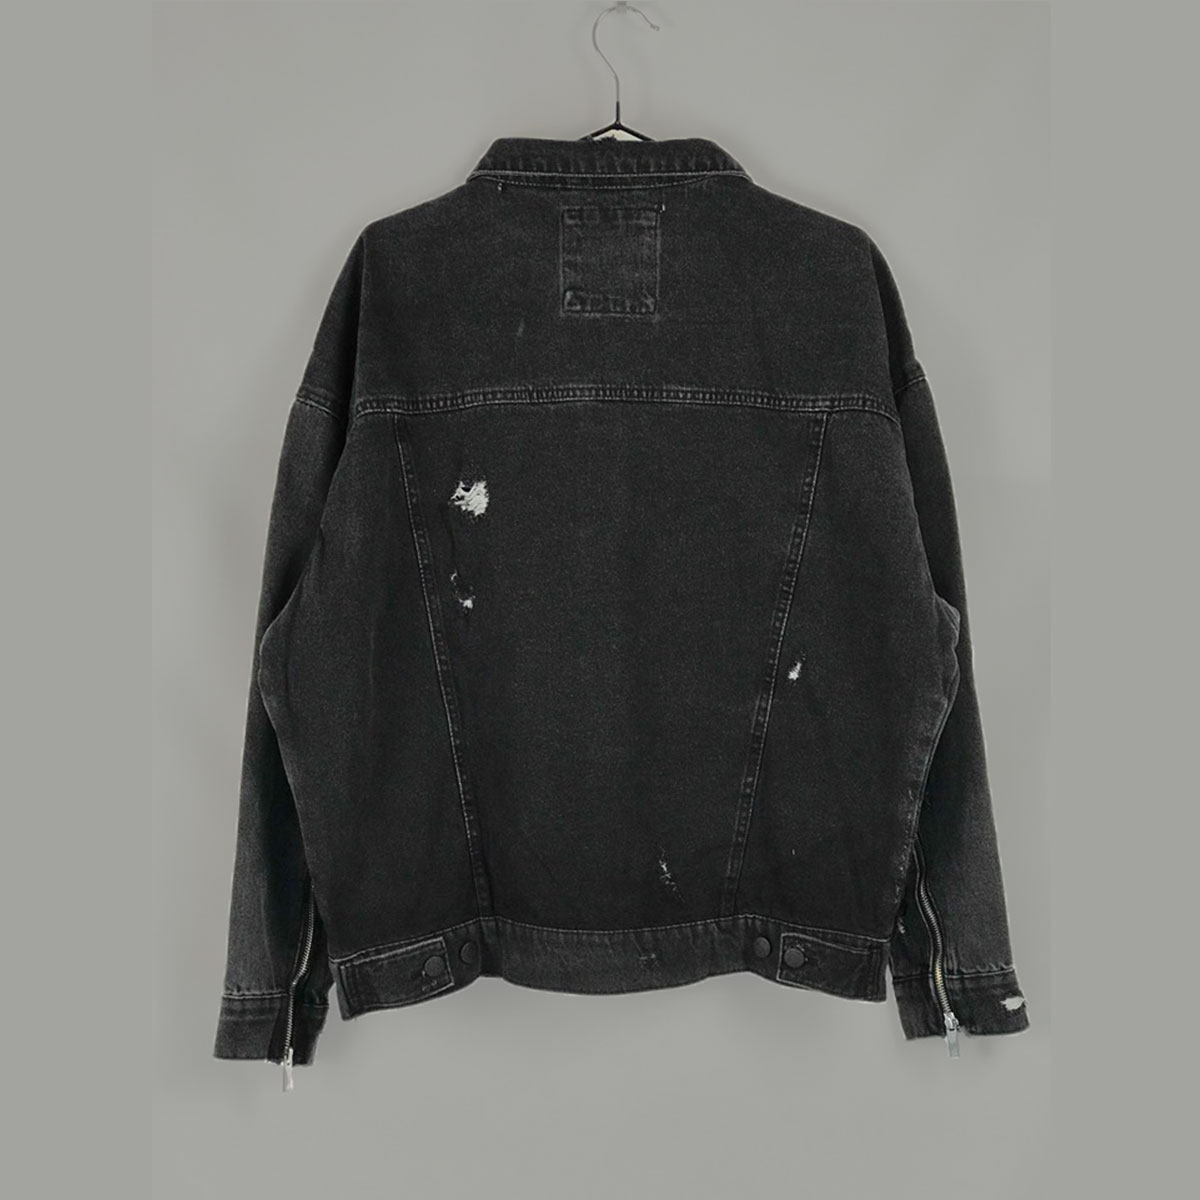 Jeans Jacket - Black